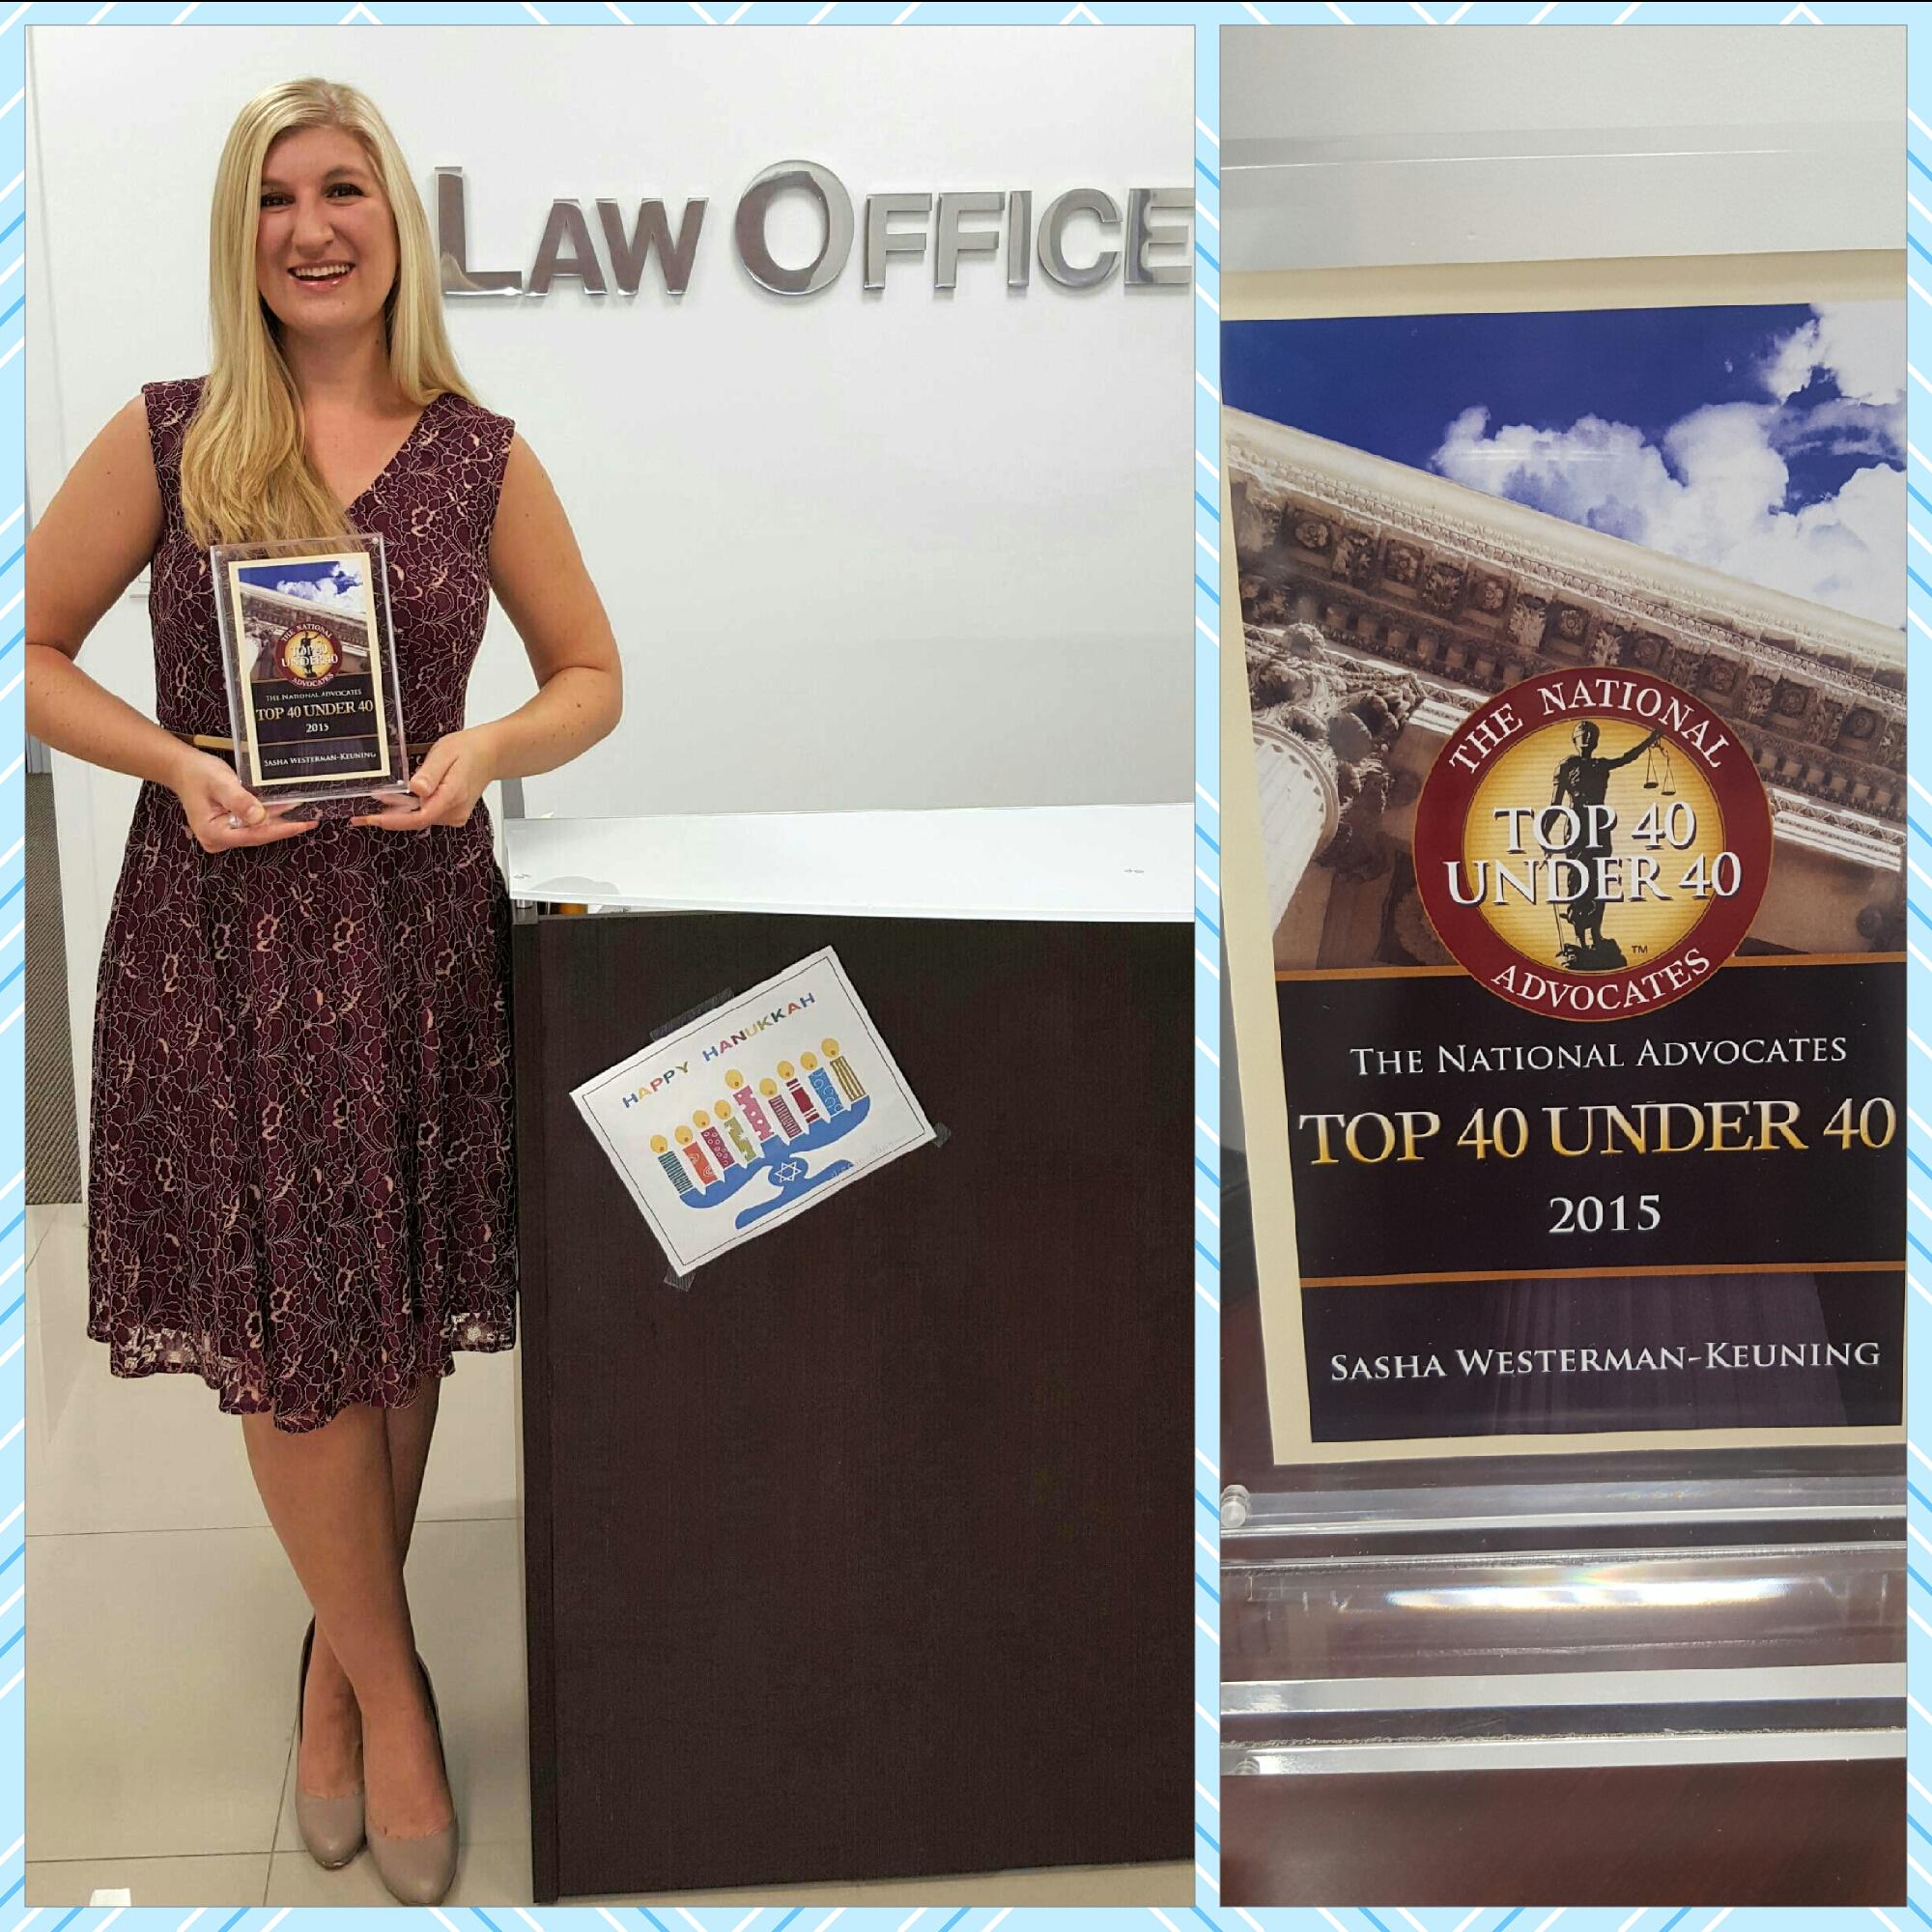 Law Office of Sasha Westerman-Keuning image 2